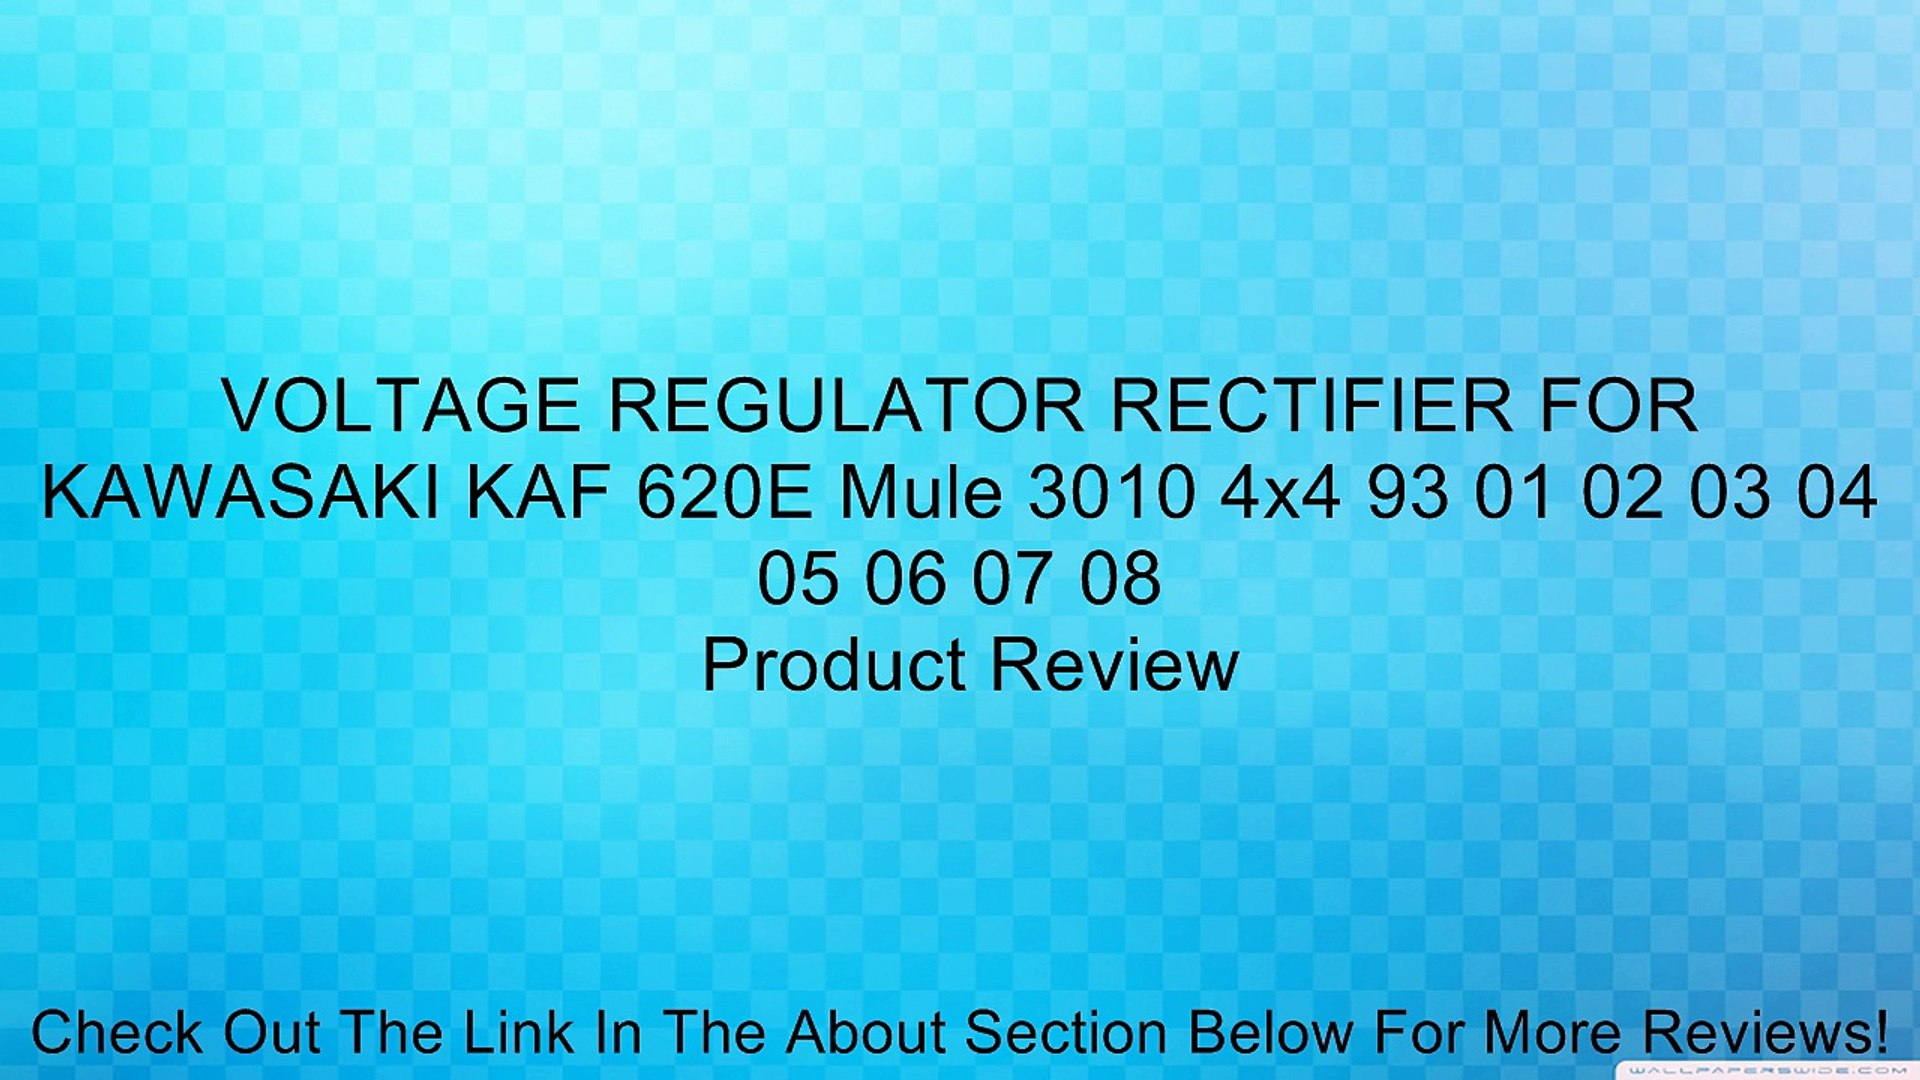 Voltage Regulator Rectifier for KAWASAKI KAF 620G Mule 3000 2001 02 03 04 05 06 07 08